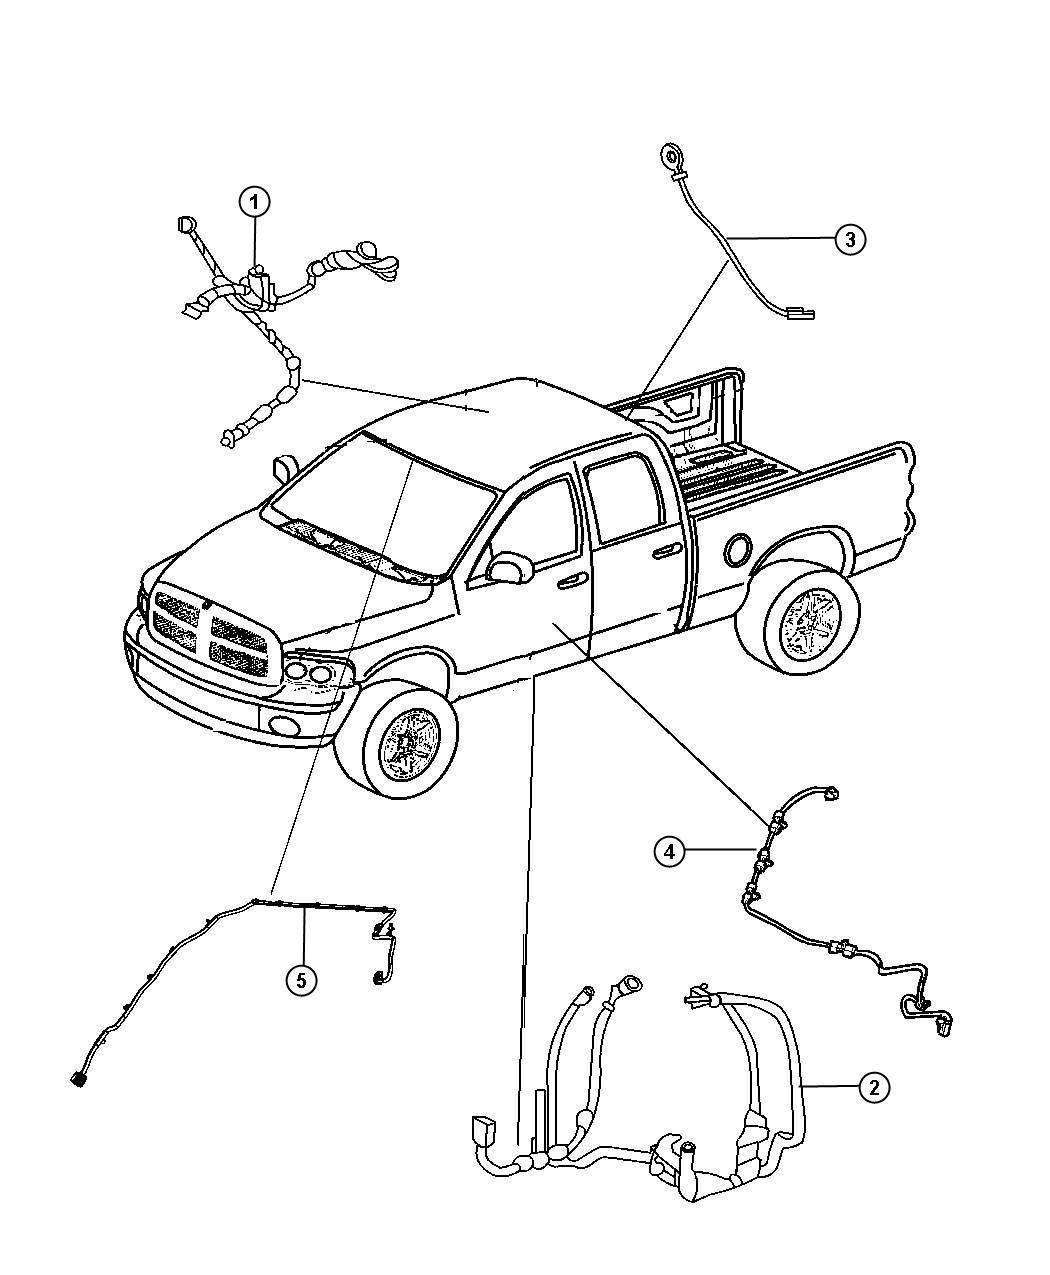 A Body Mopar Wiring Diagram